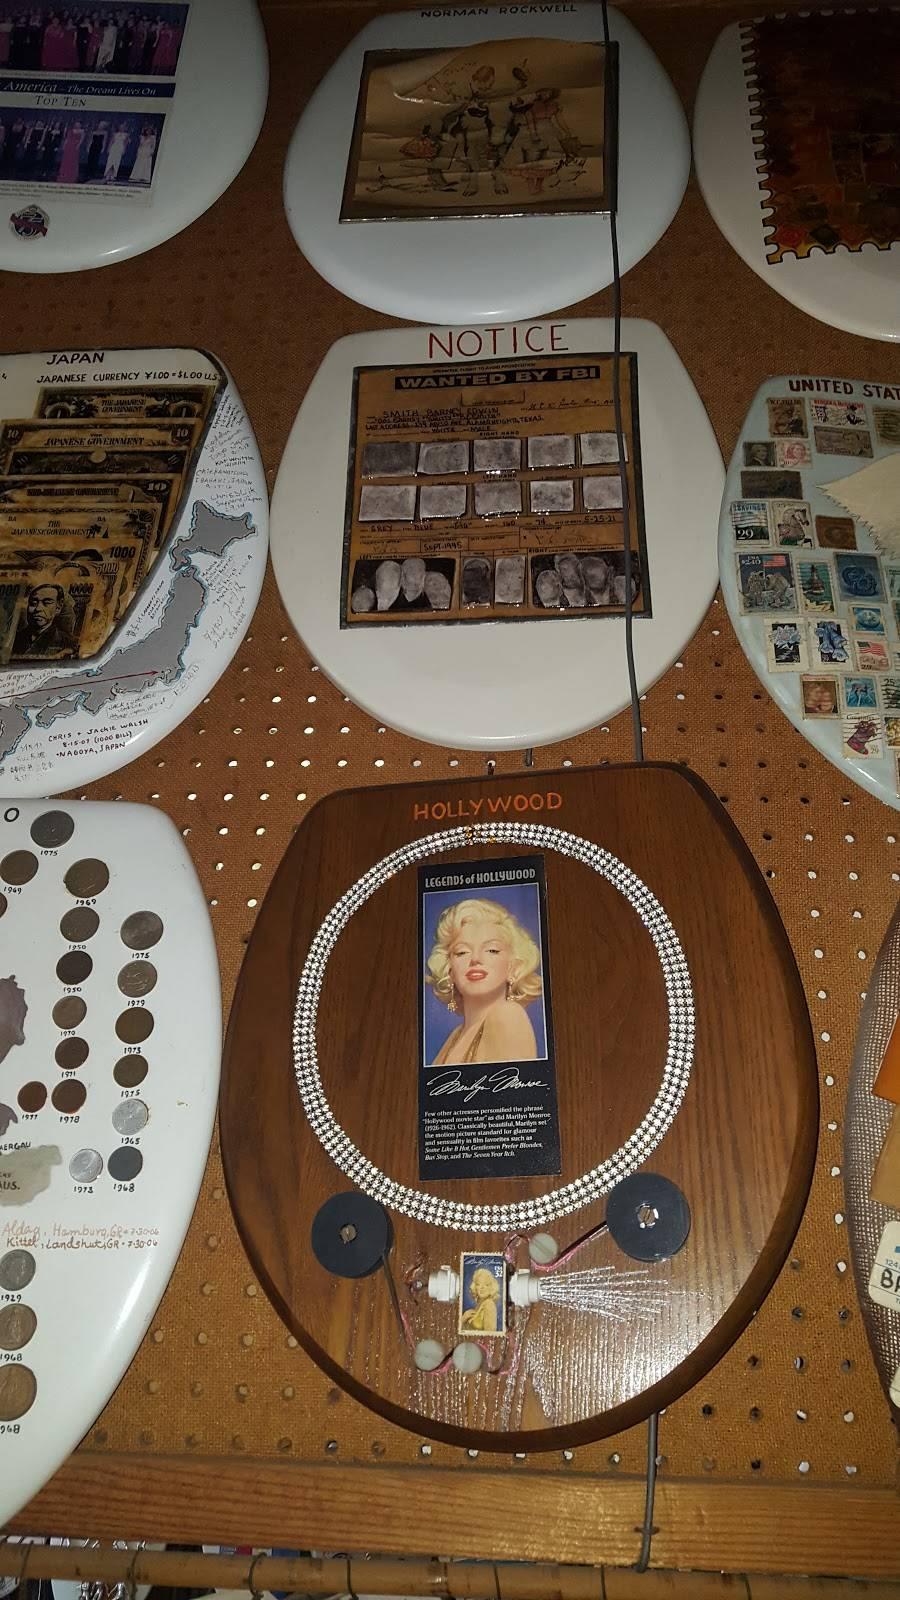 Barney Smiths Toilet Seat Art Museum - museum    Photo 6 of 9   Address: 239 Abiso Ave, San Antonio, TX 78209, USA   Phone: (210) 824-7791